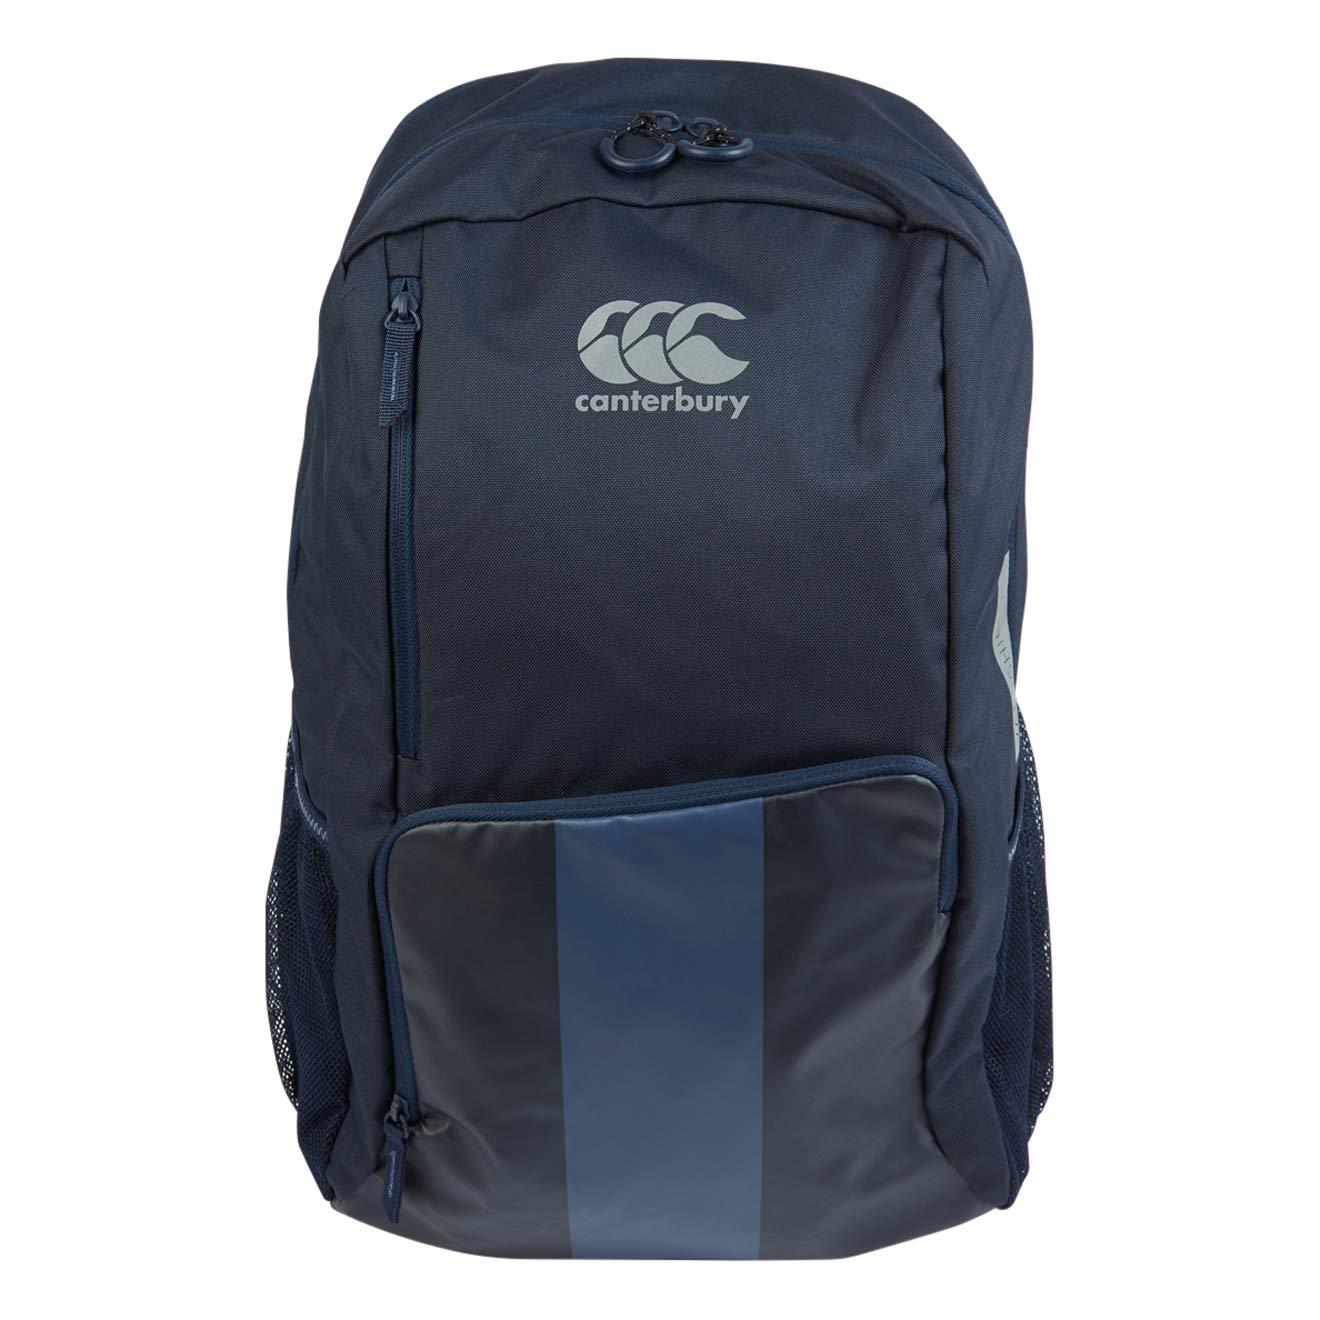 Canterbury Of New Zealand Unisex Vaposhield Medium Backpack Black O/S E201394-989-O/S